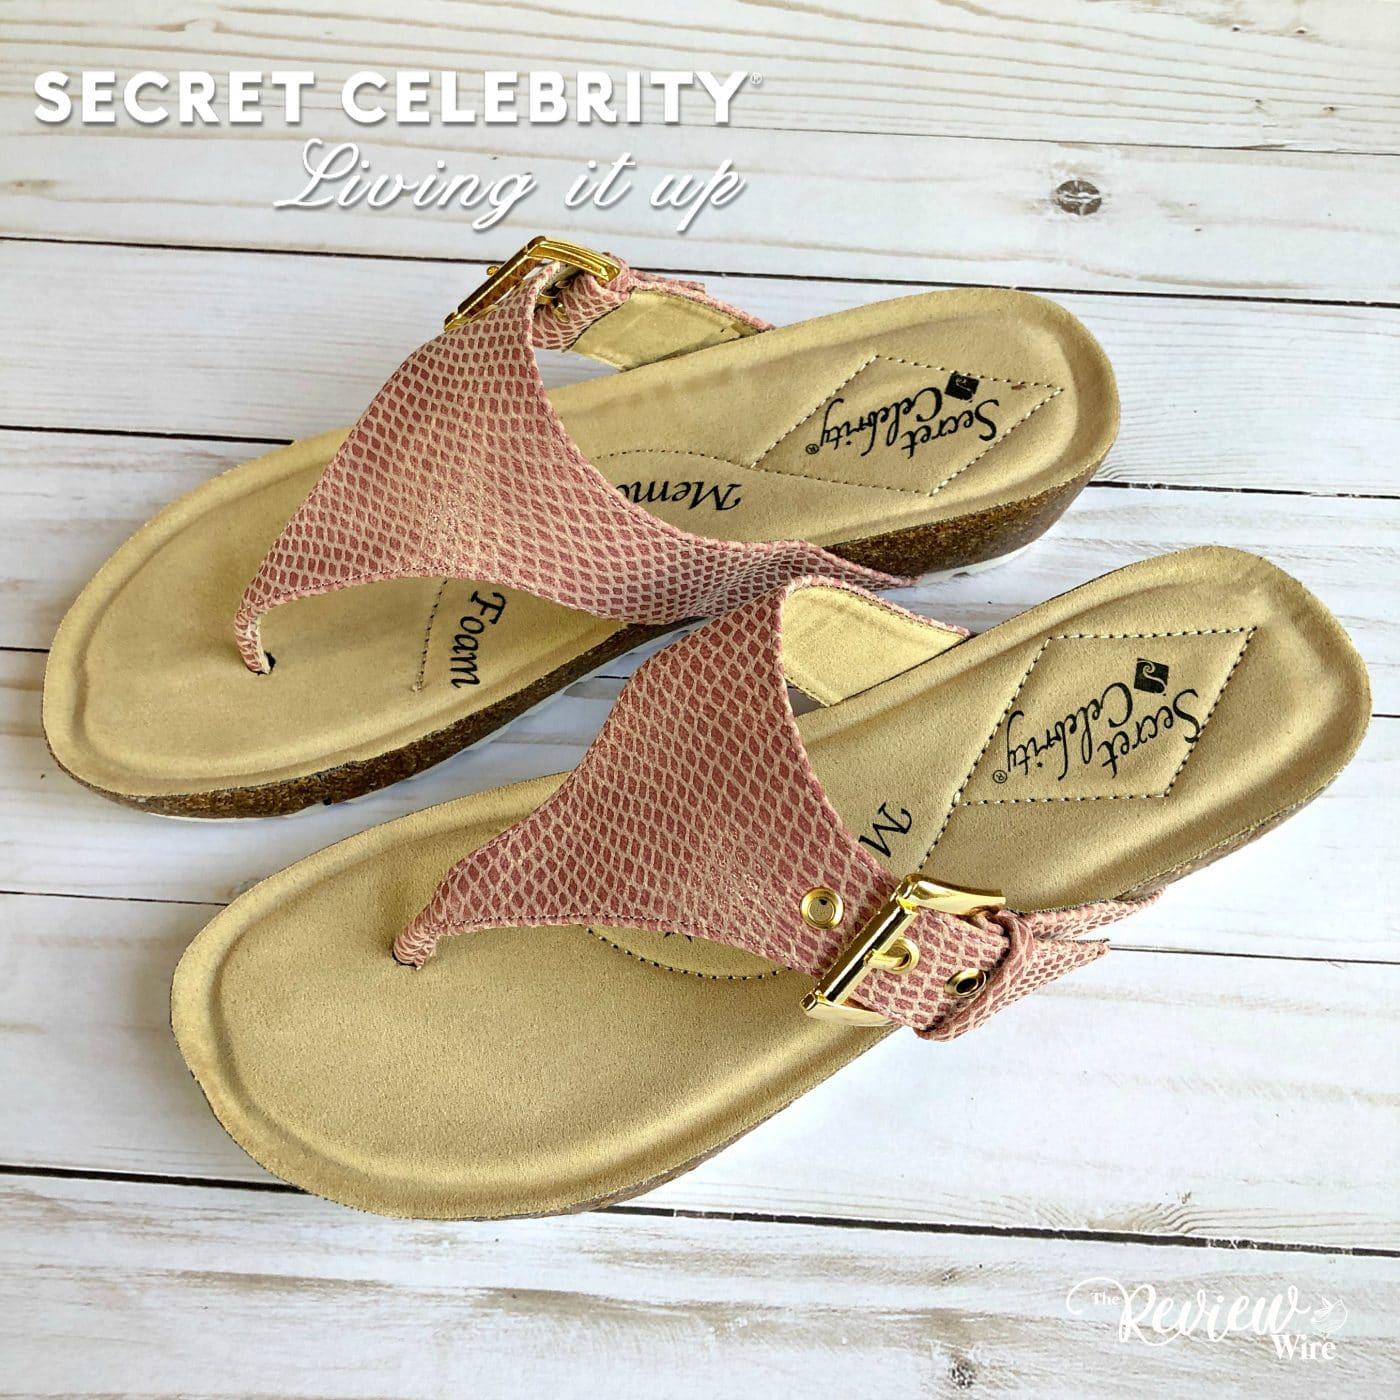 Secret Celebrity Fresh Vibe Sandals